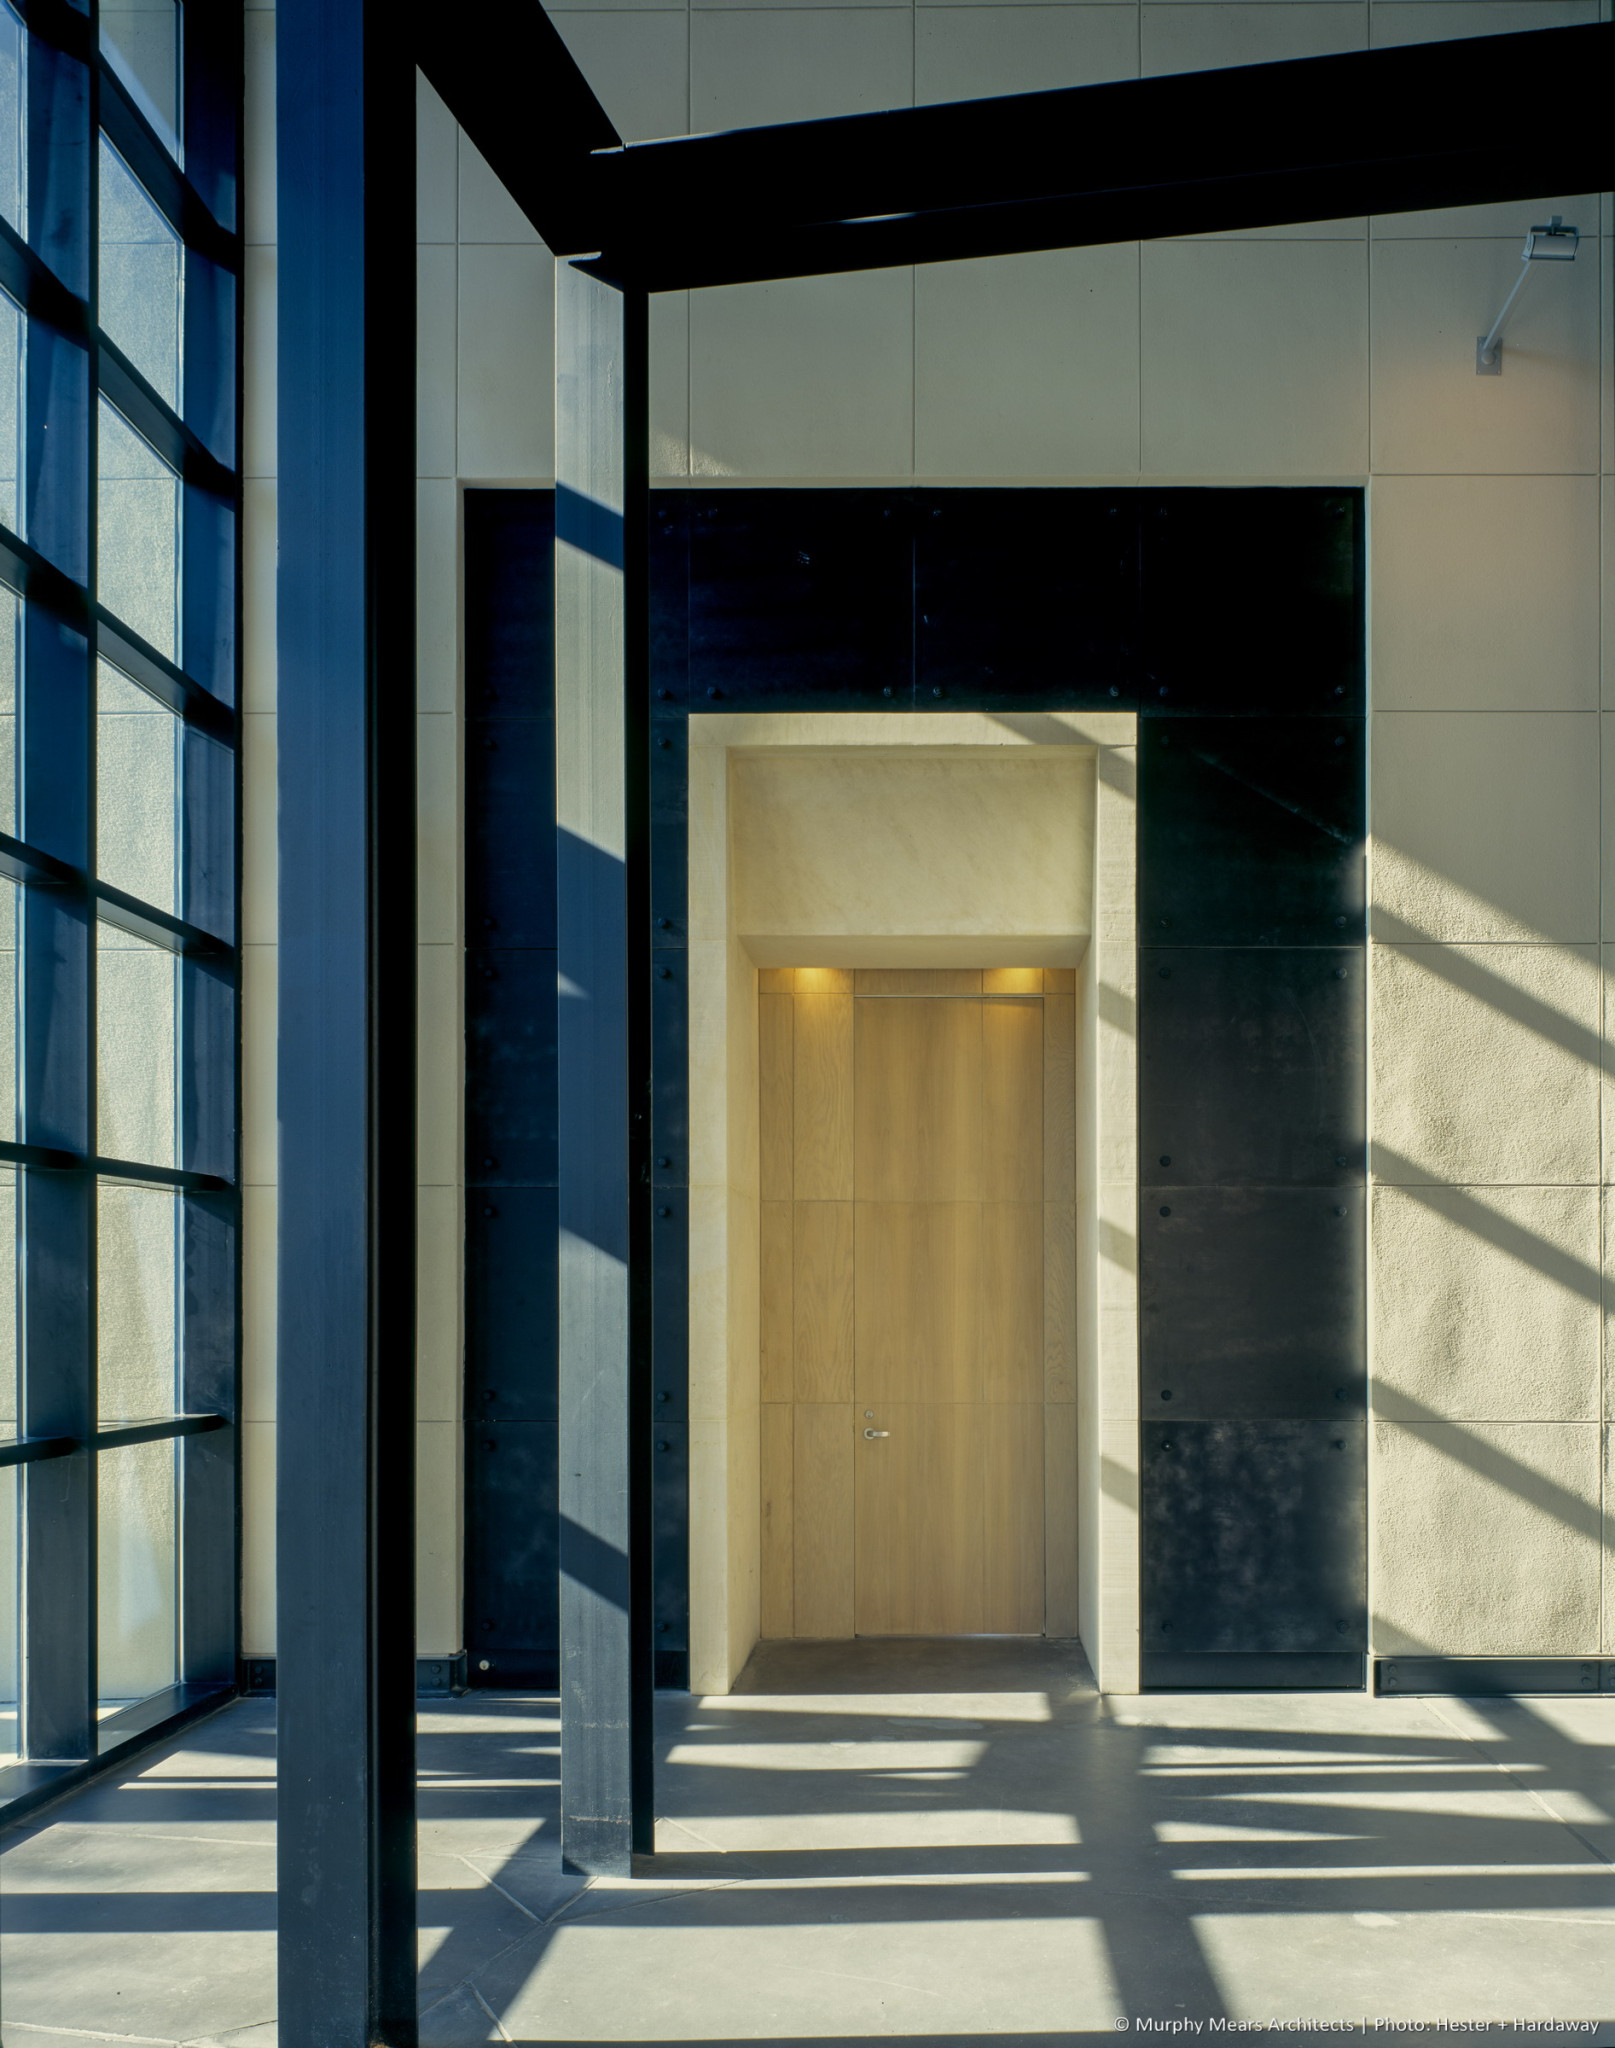 w-holocaust-memorial-room-entrance-door